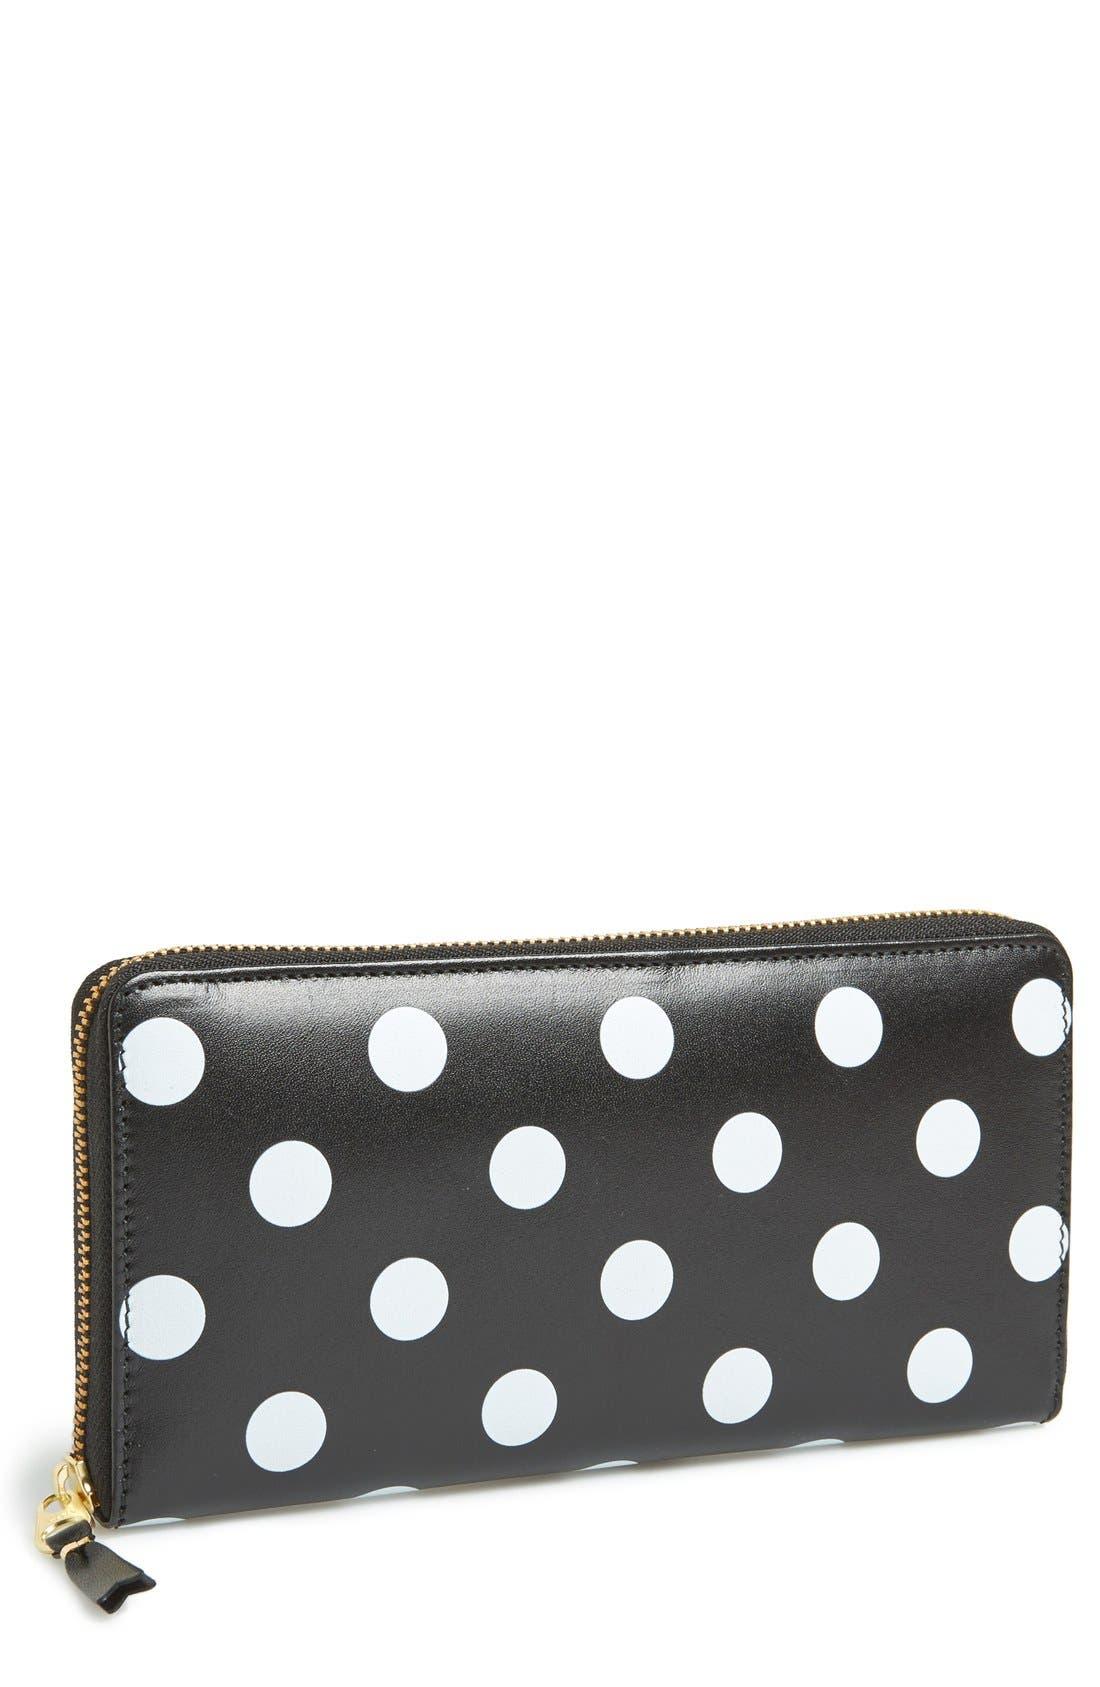 Main Image - Comme des Garçons 'Polka Dot' Continental Wallet